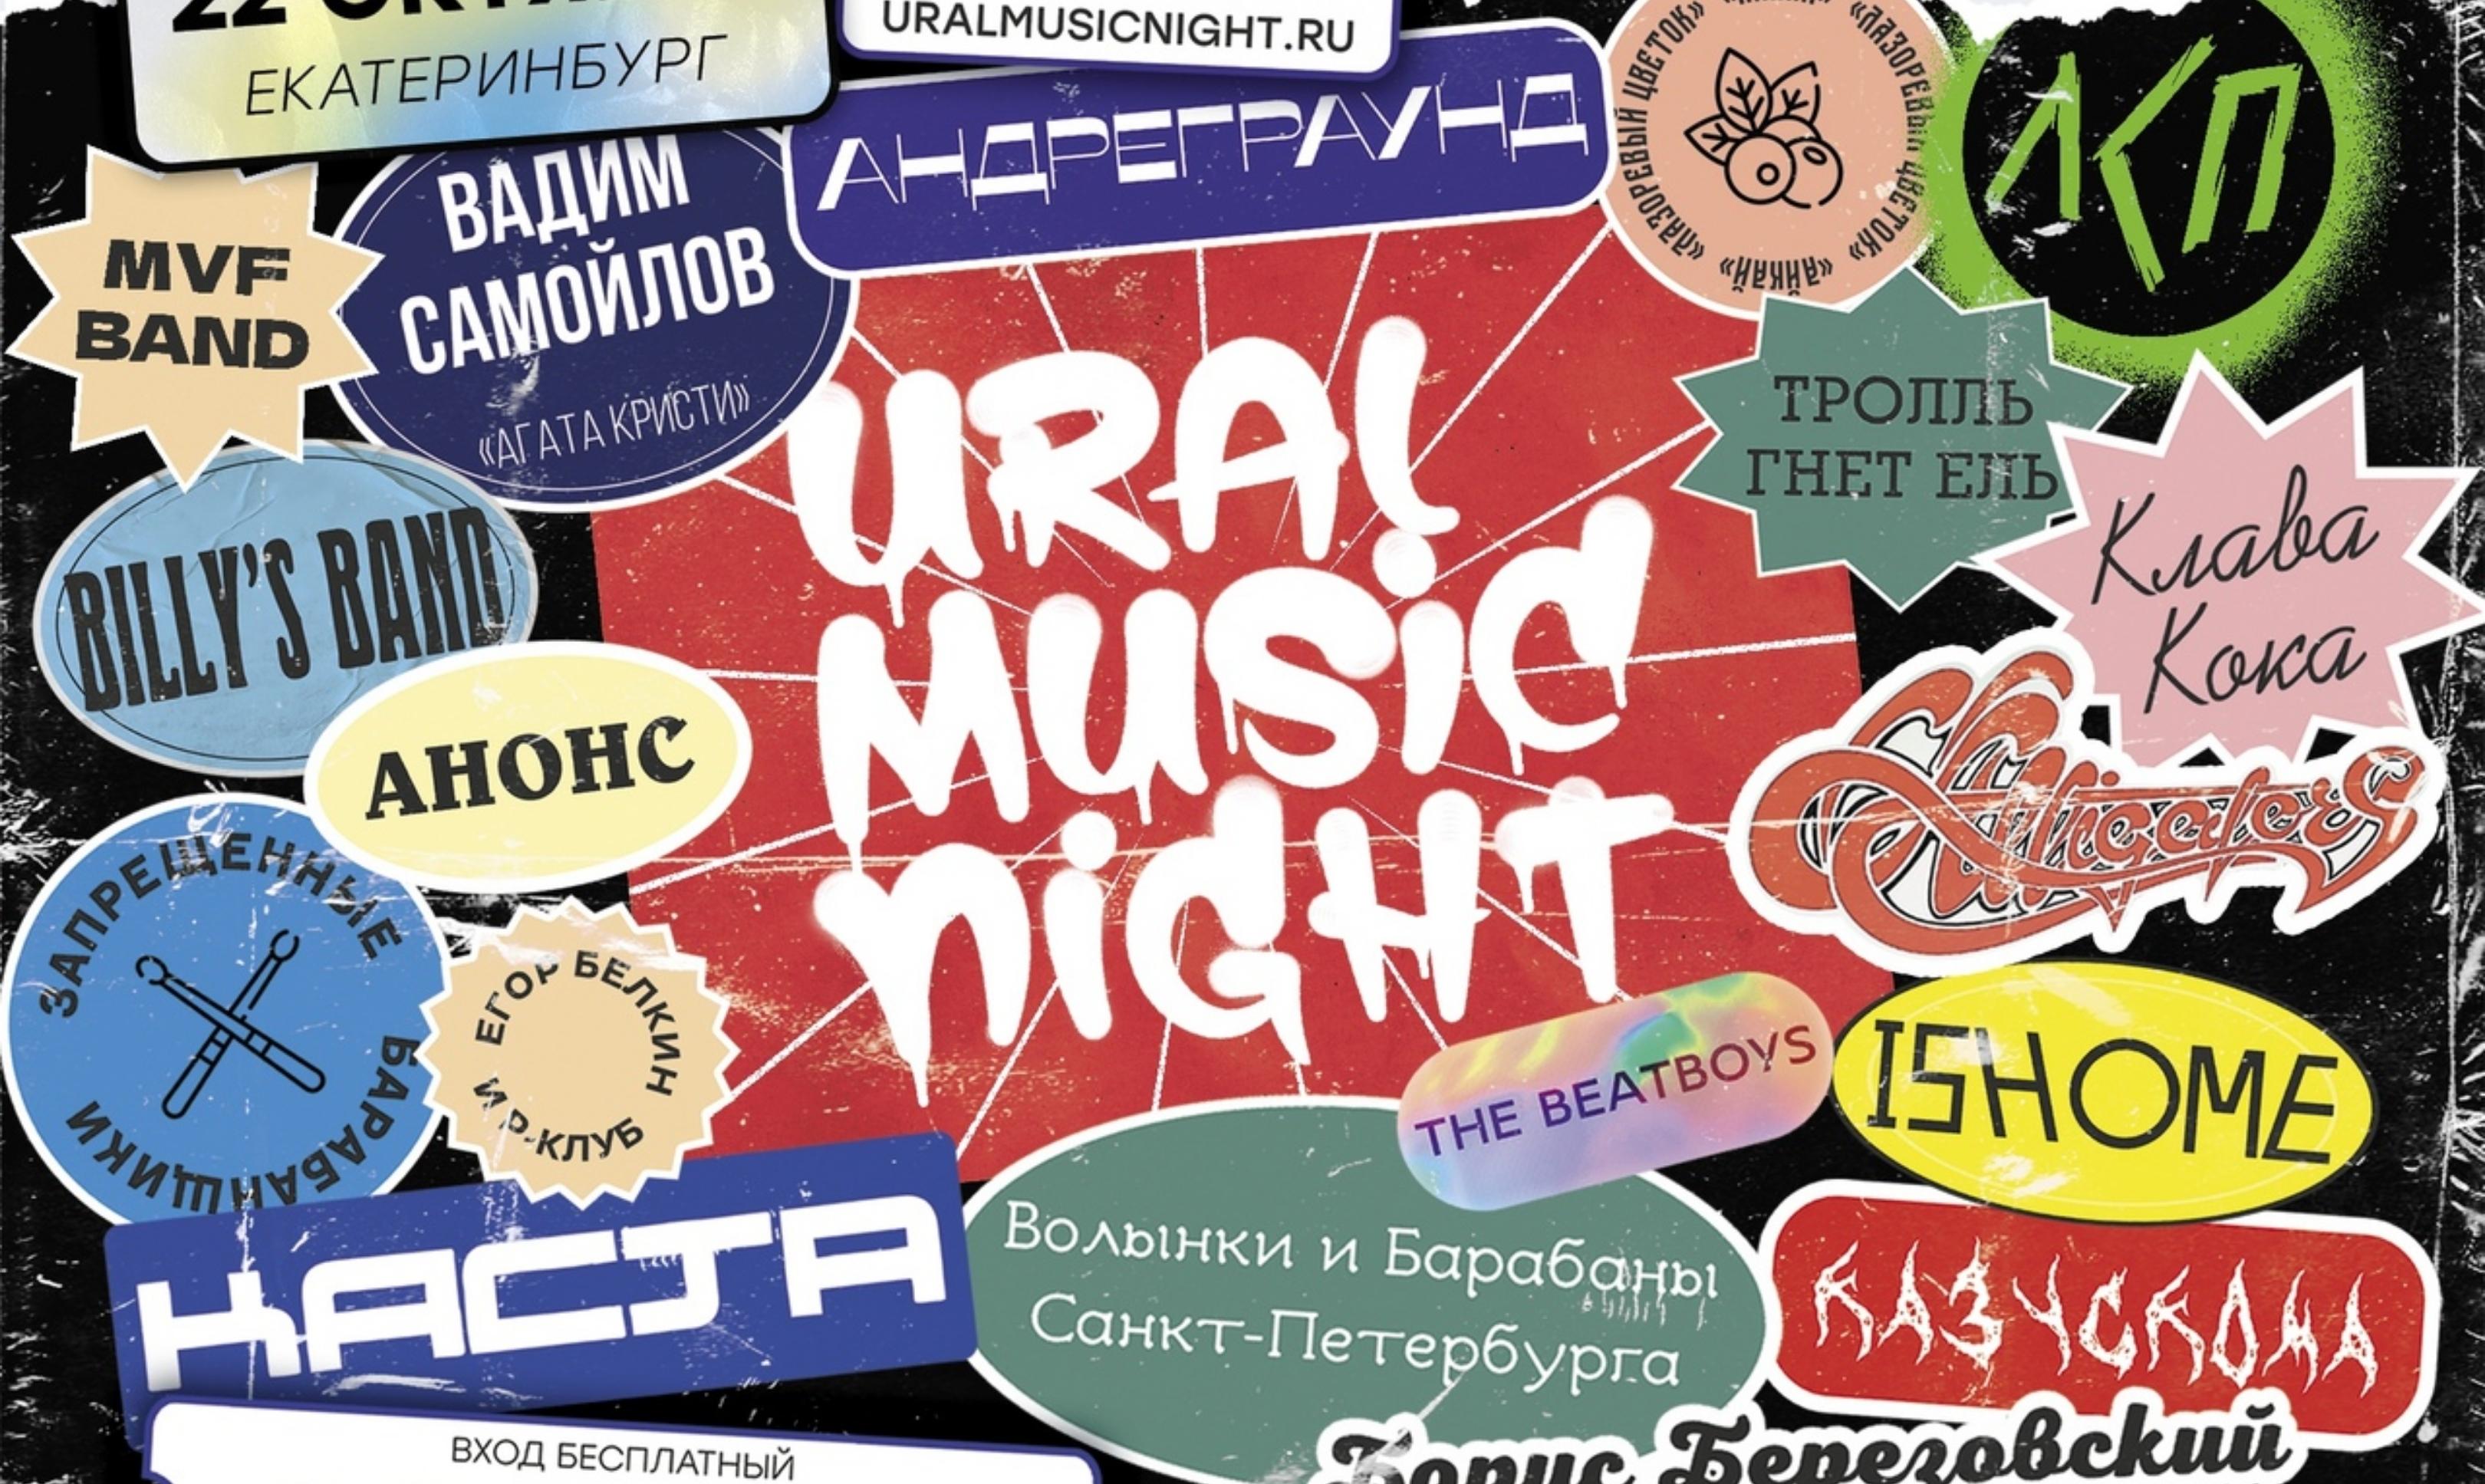 Еще раз про Ural music night